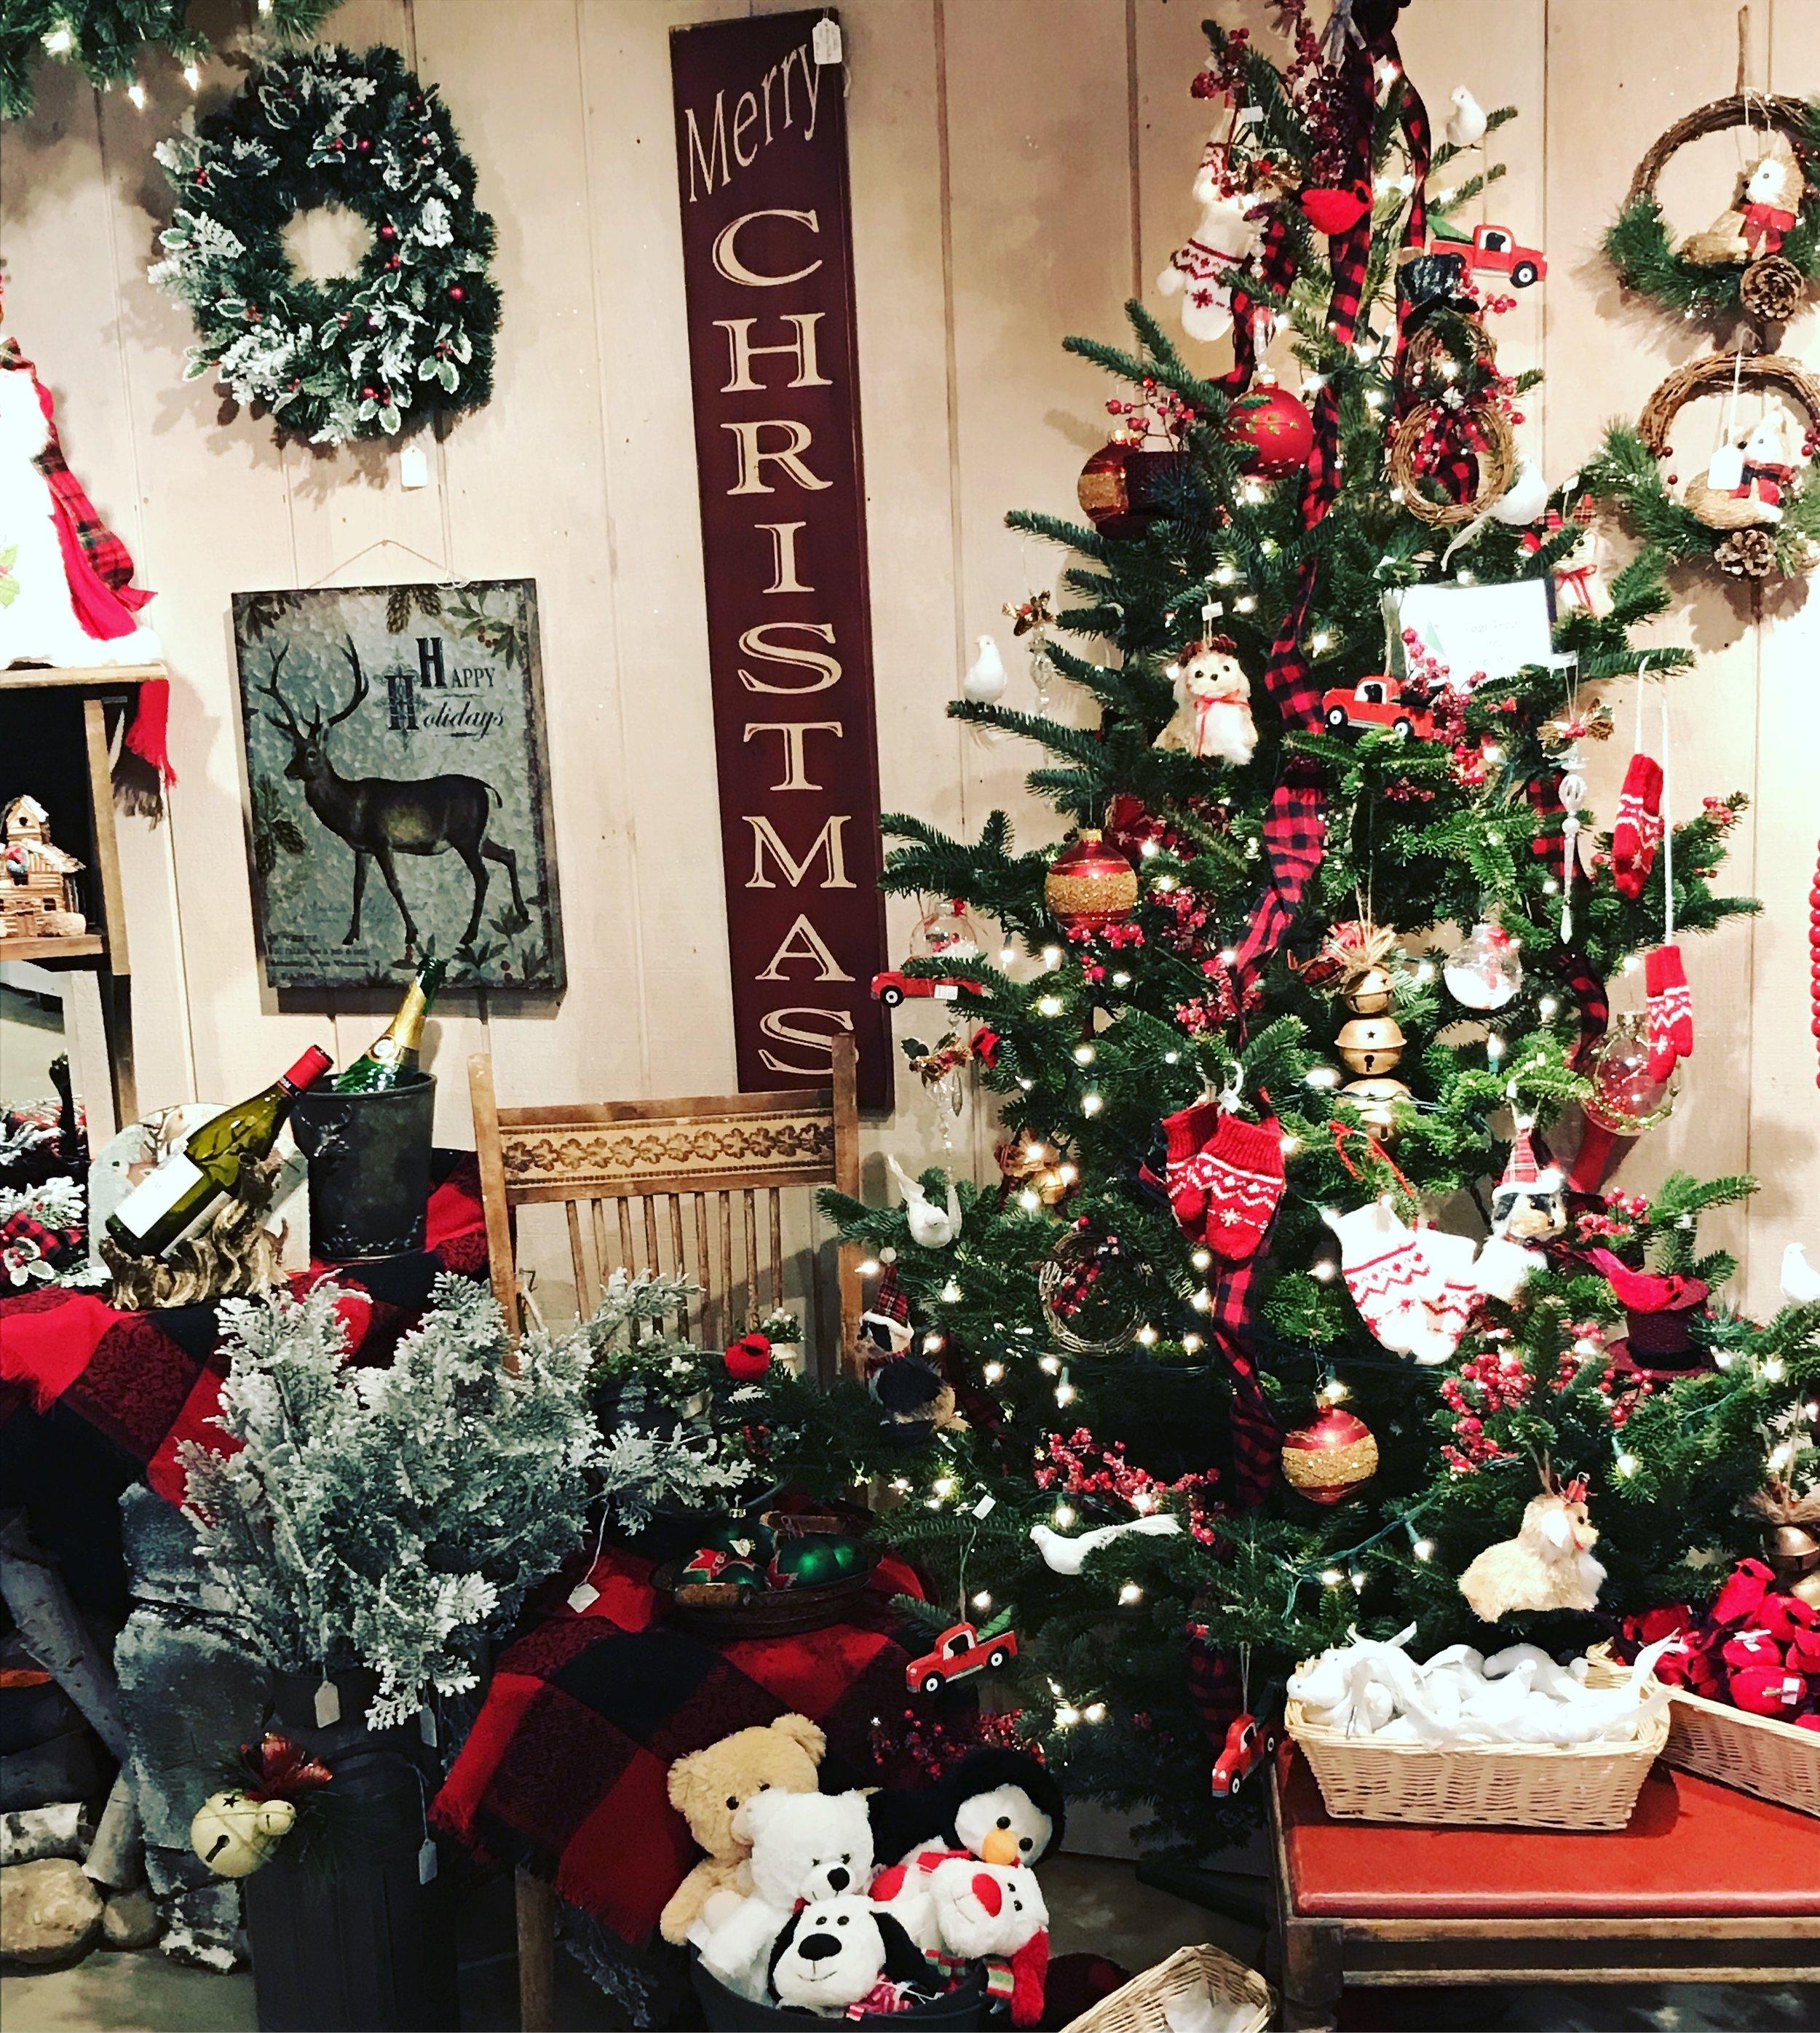 SummersChristmasTreeFarm_ChristmasShopDetail_2.jpg